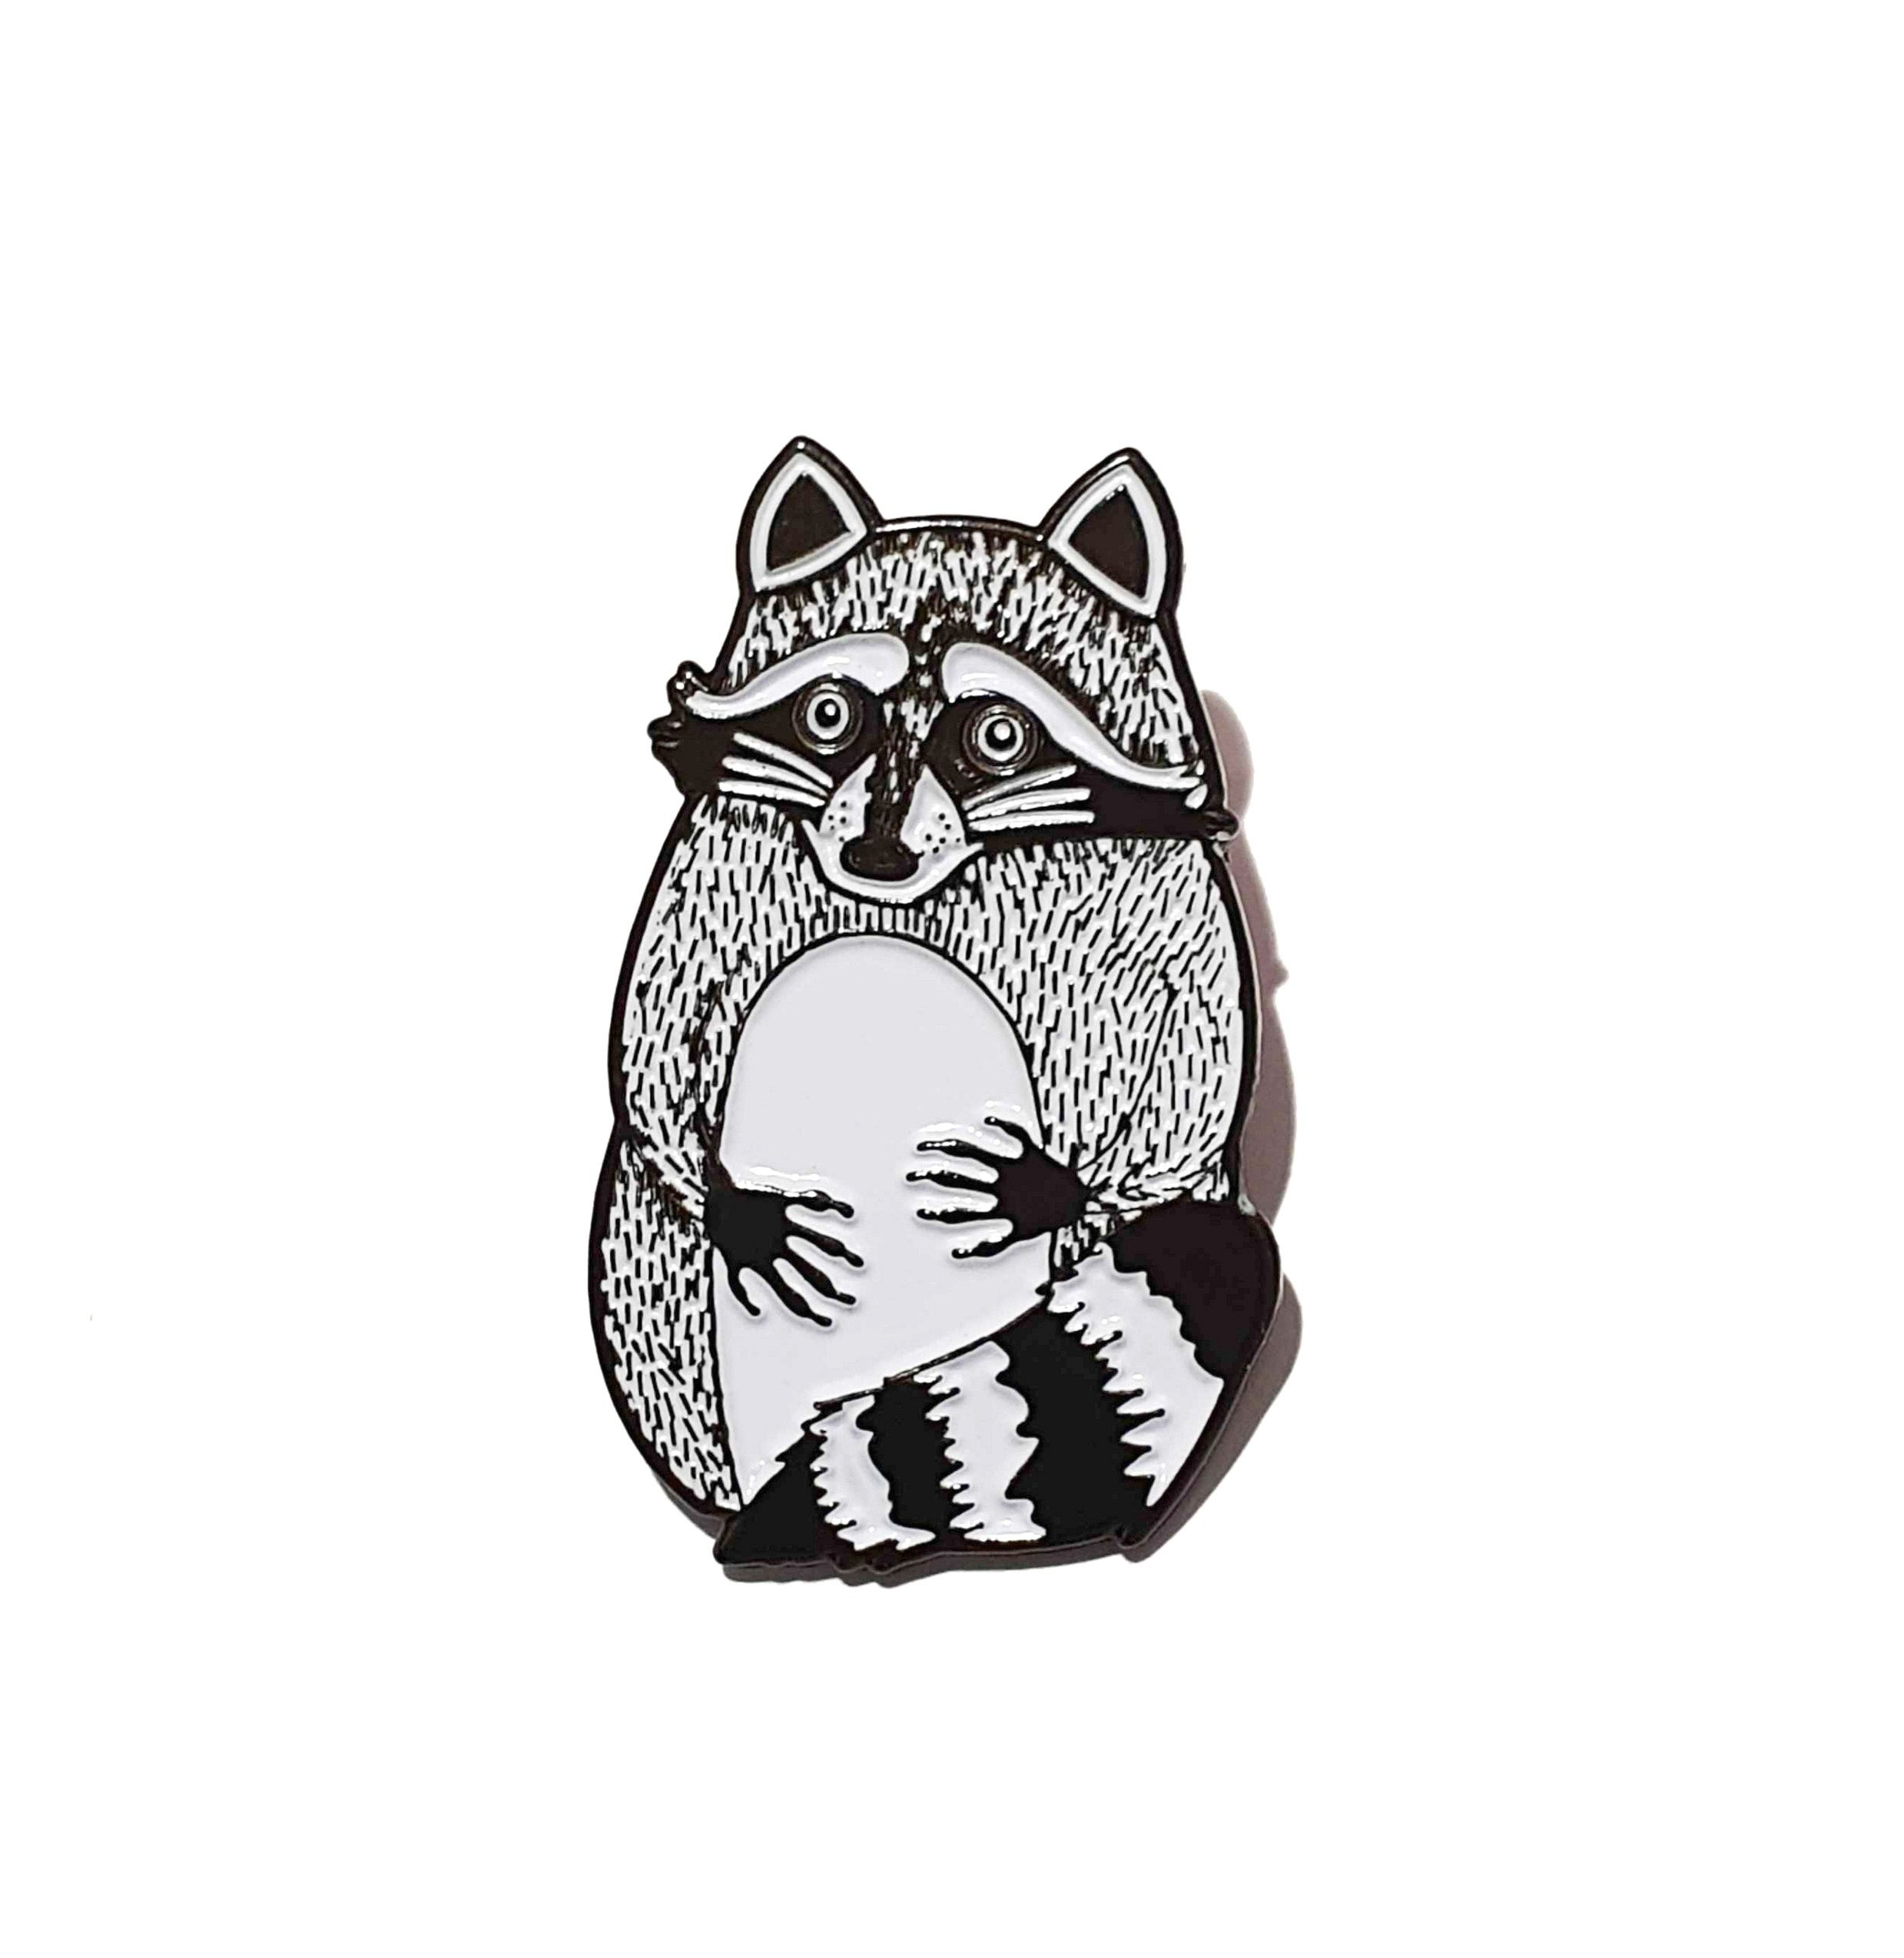 Raccoon enamel pin